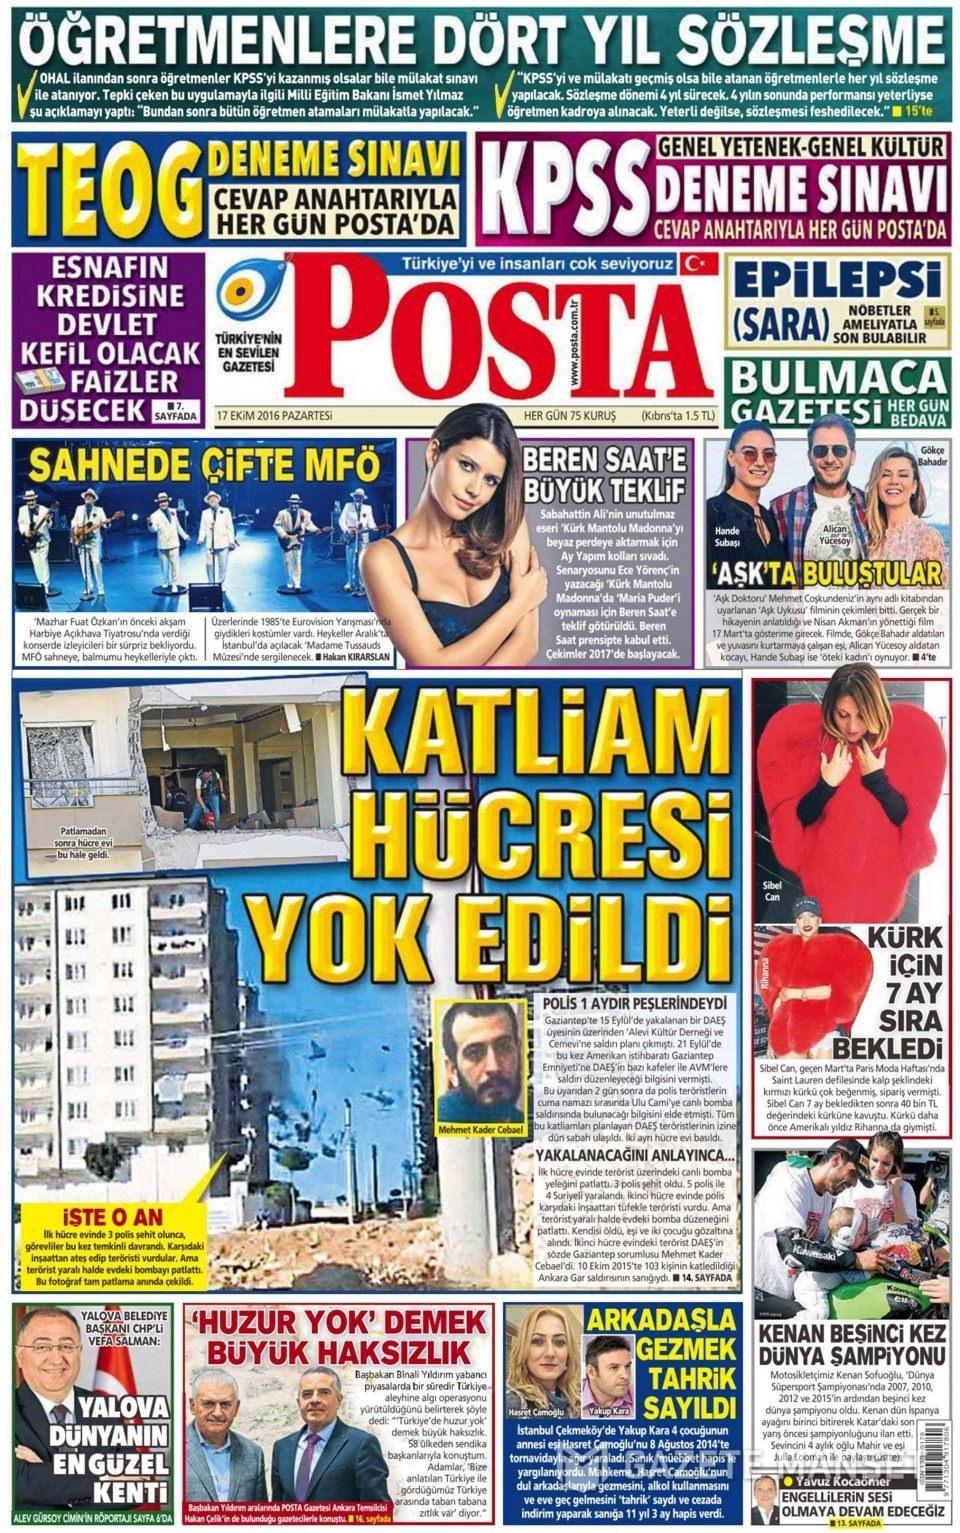 17 Ekim Pazartesi gazete manşetleri 16